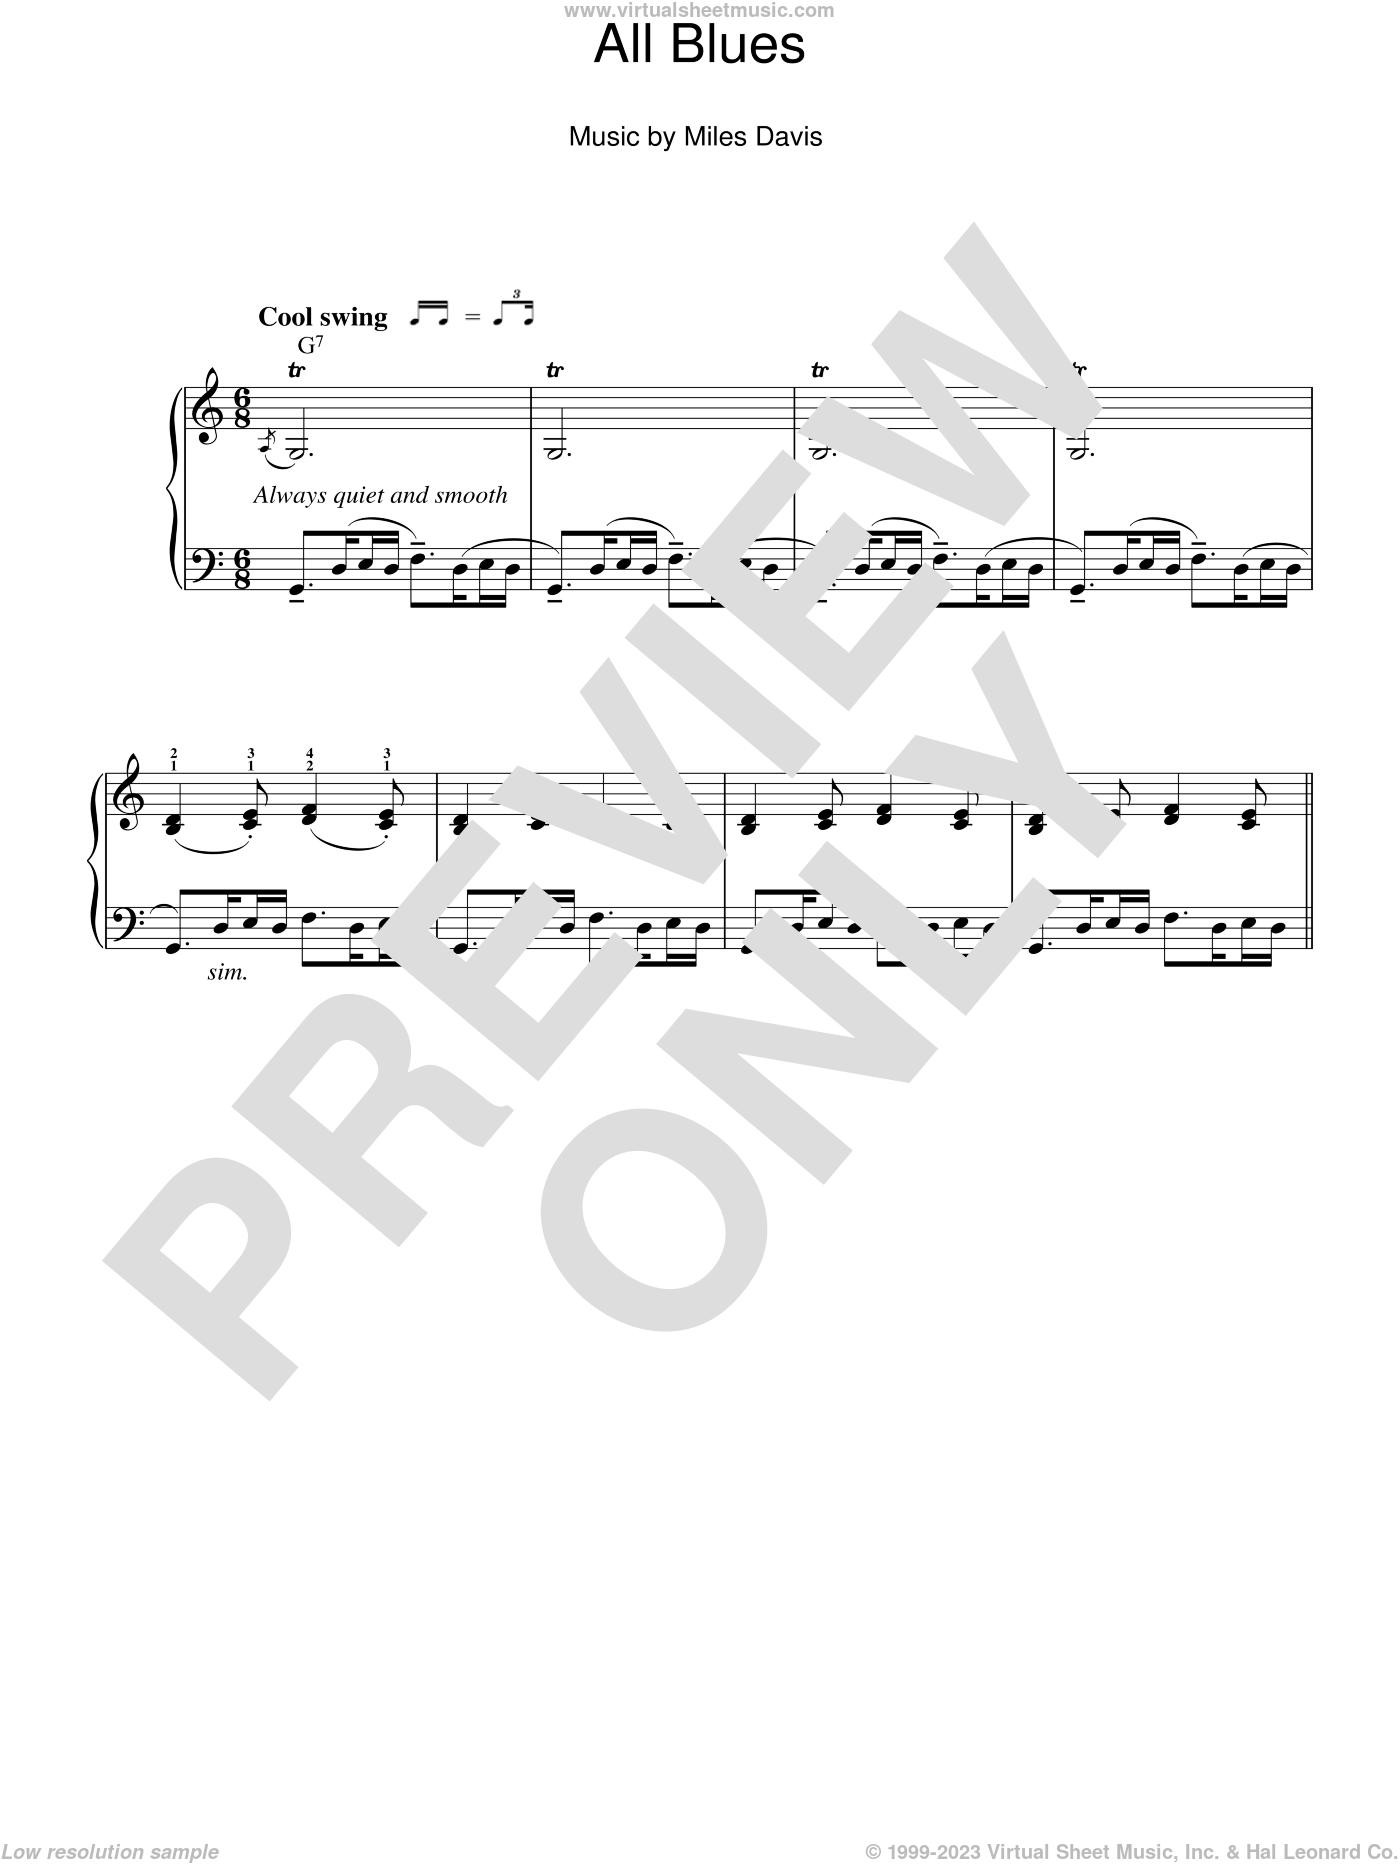 All Blues sheet music for piano solo by Miles Davis, intermediate skill level